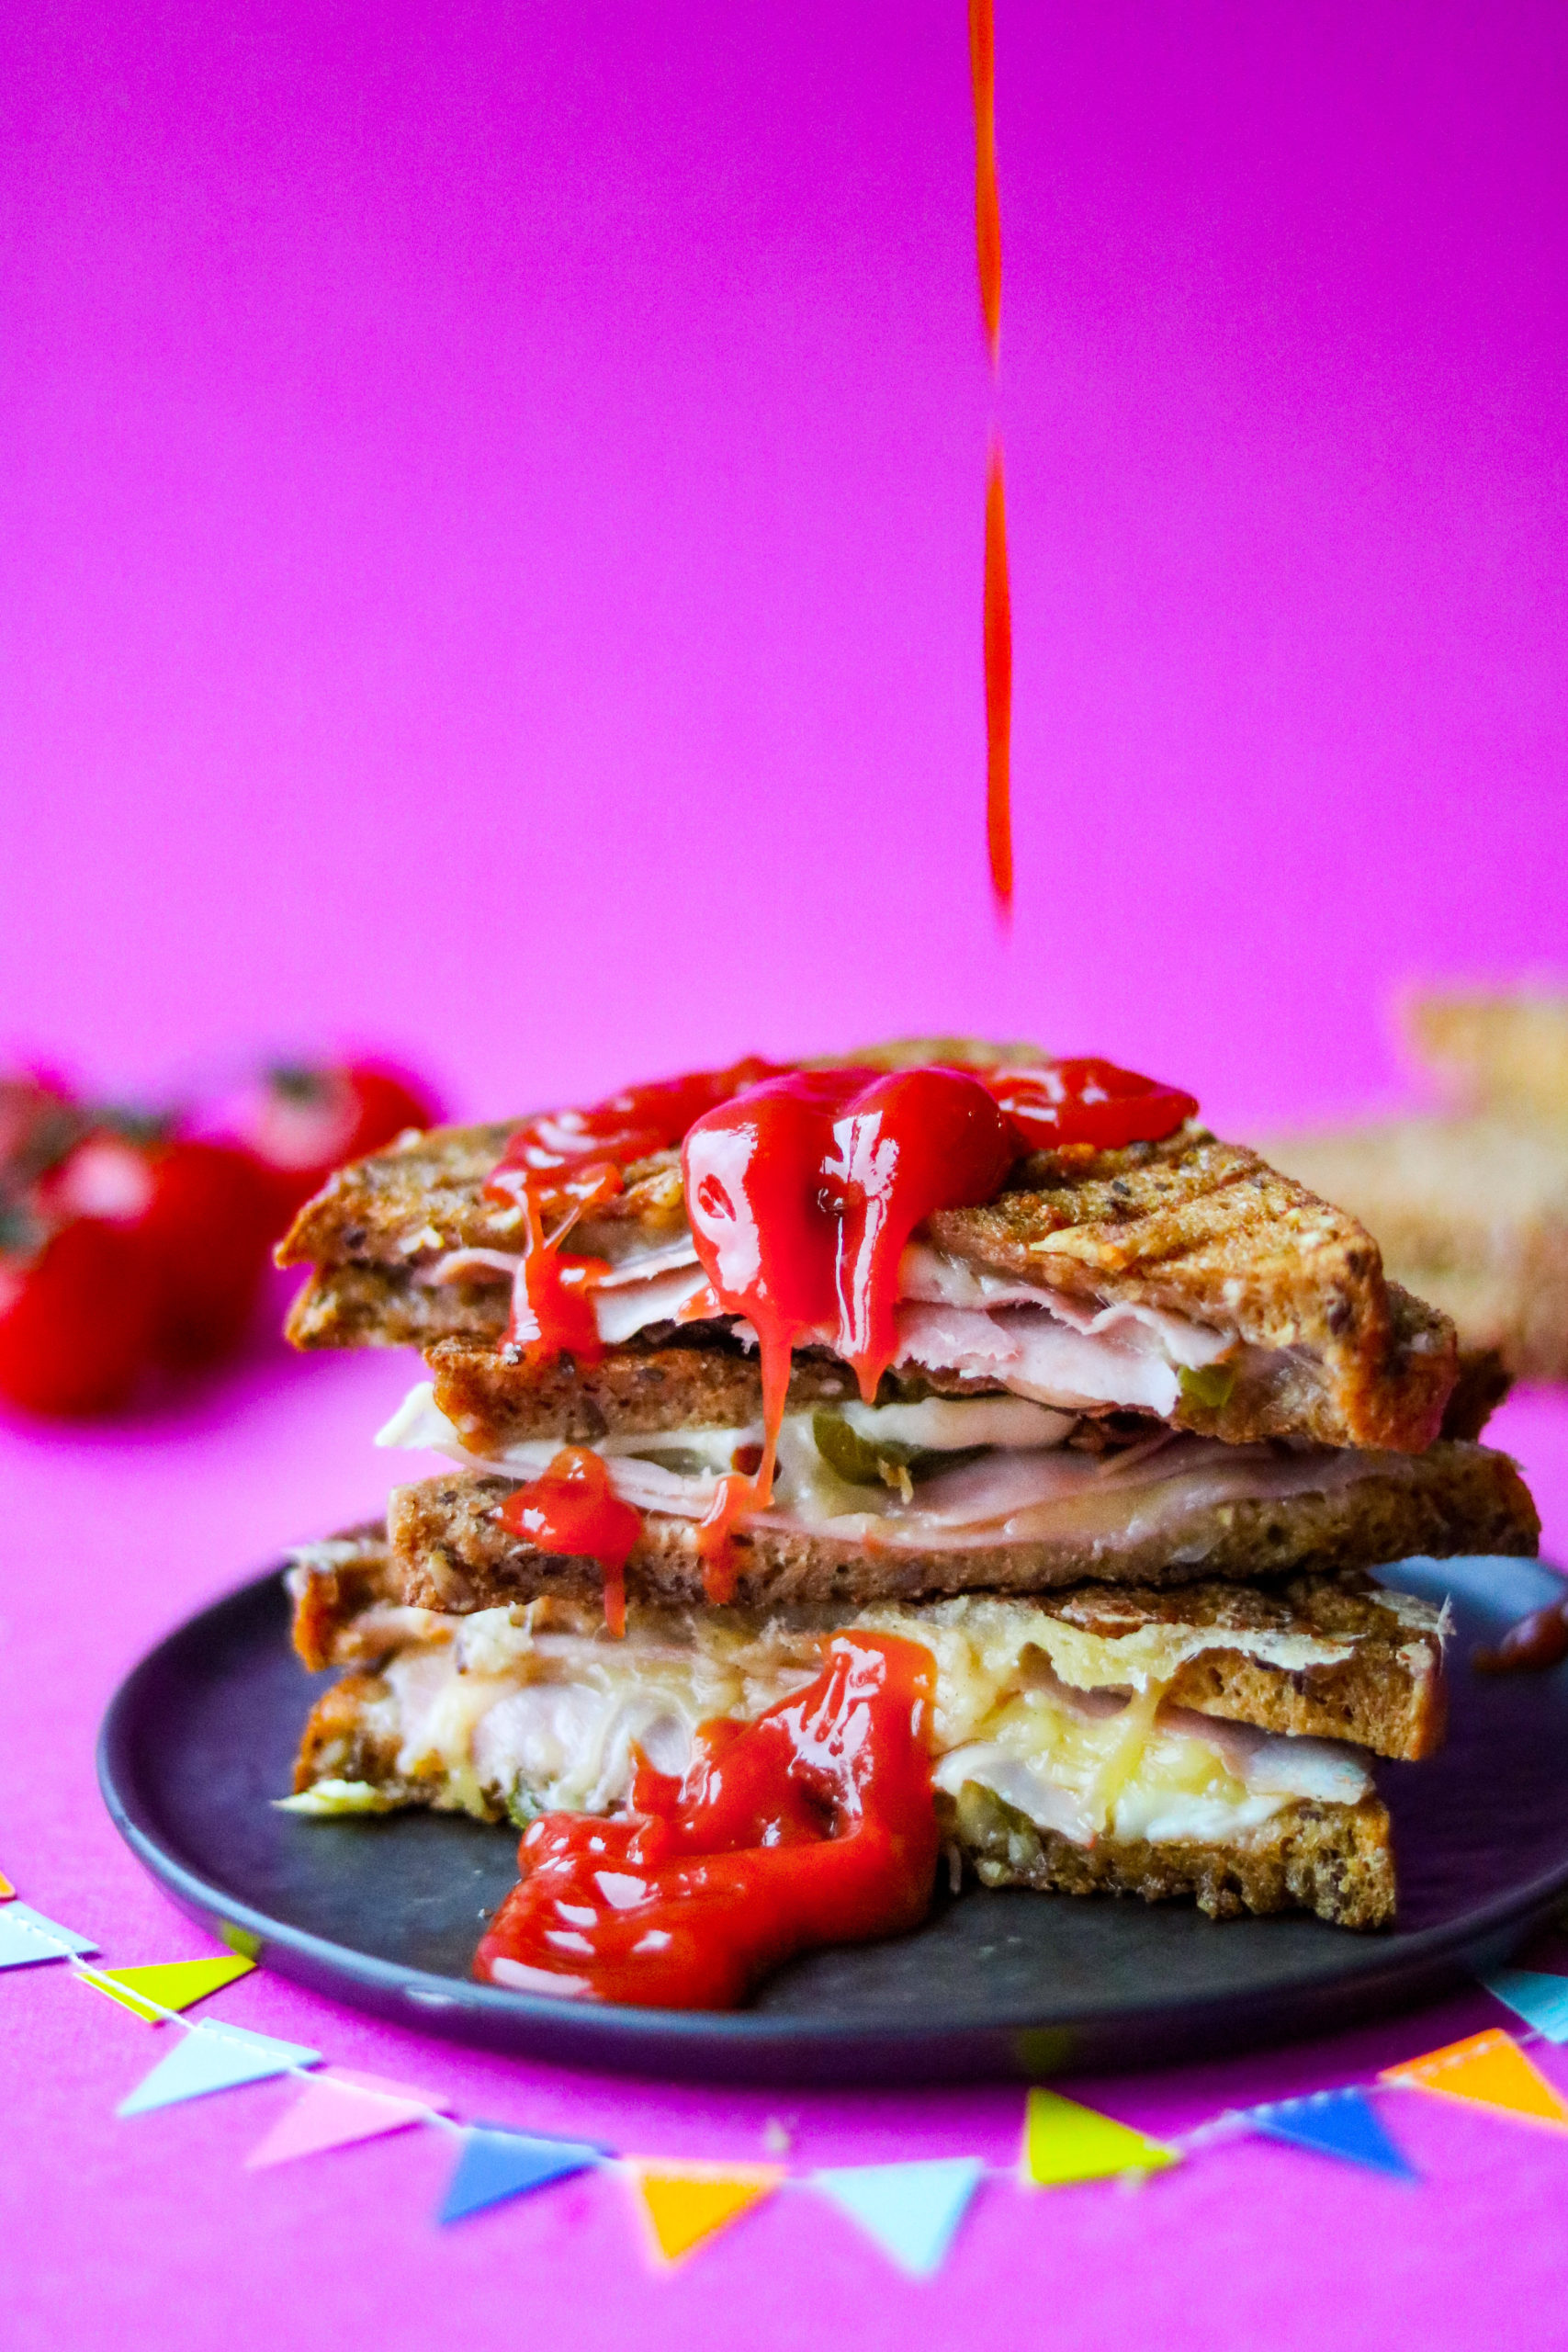 De lekkerste glutenvrije tosti's maak je zo!